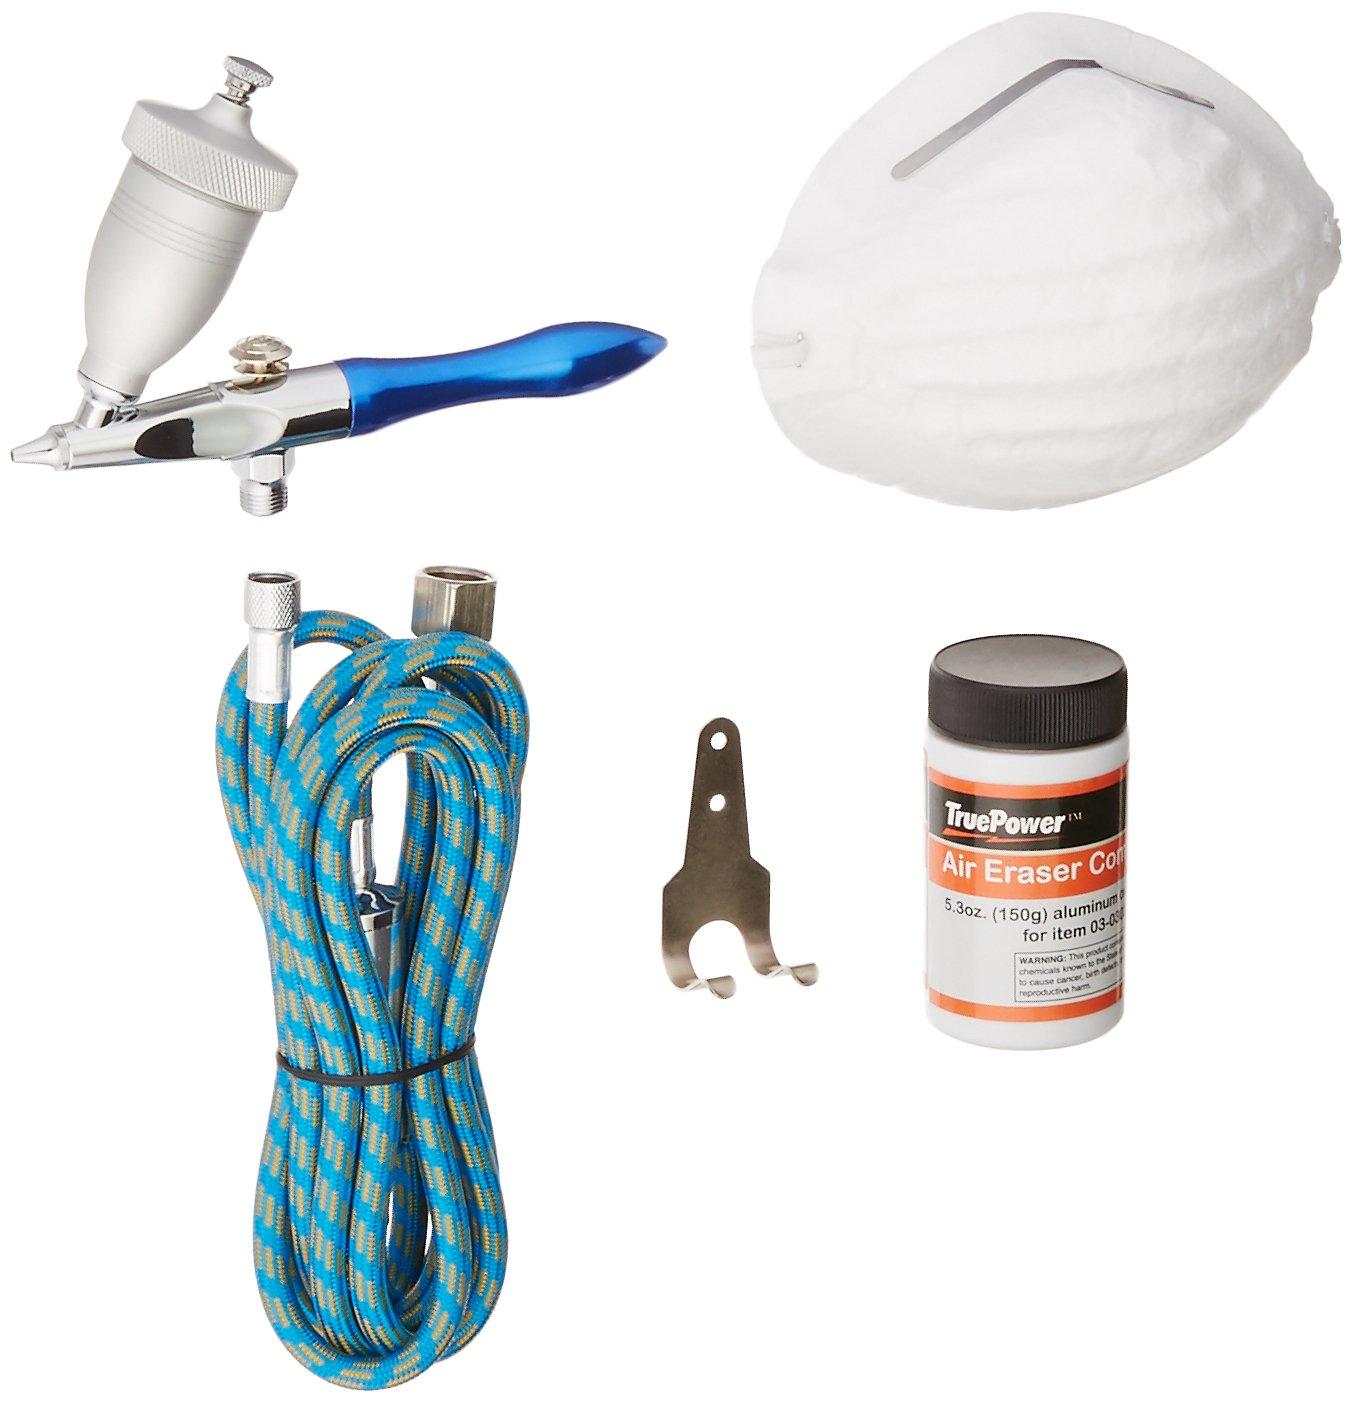 TruePower Air Eraser, Airbrush Sandblaster, Abrasive Sprayer and Glass Etcher Kit Gino Development Inc. 03-0302